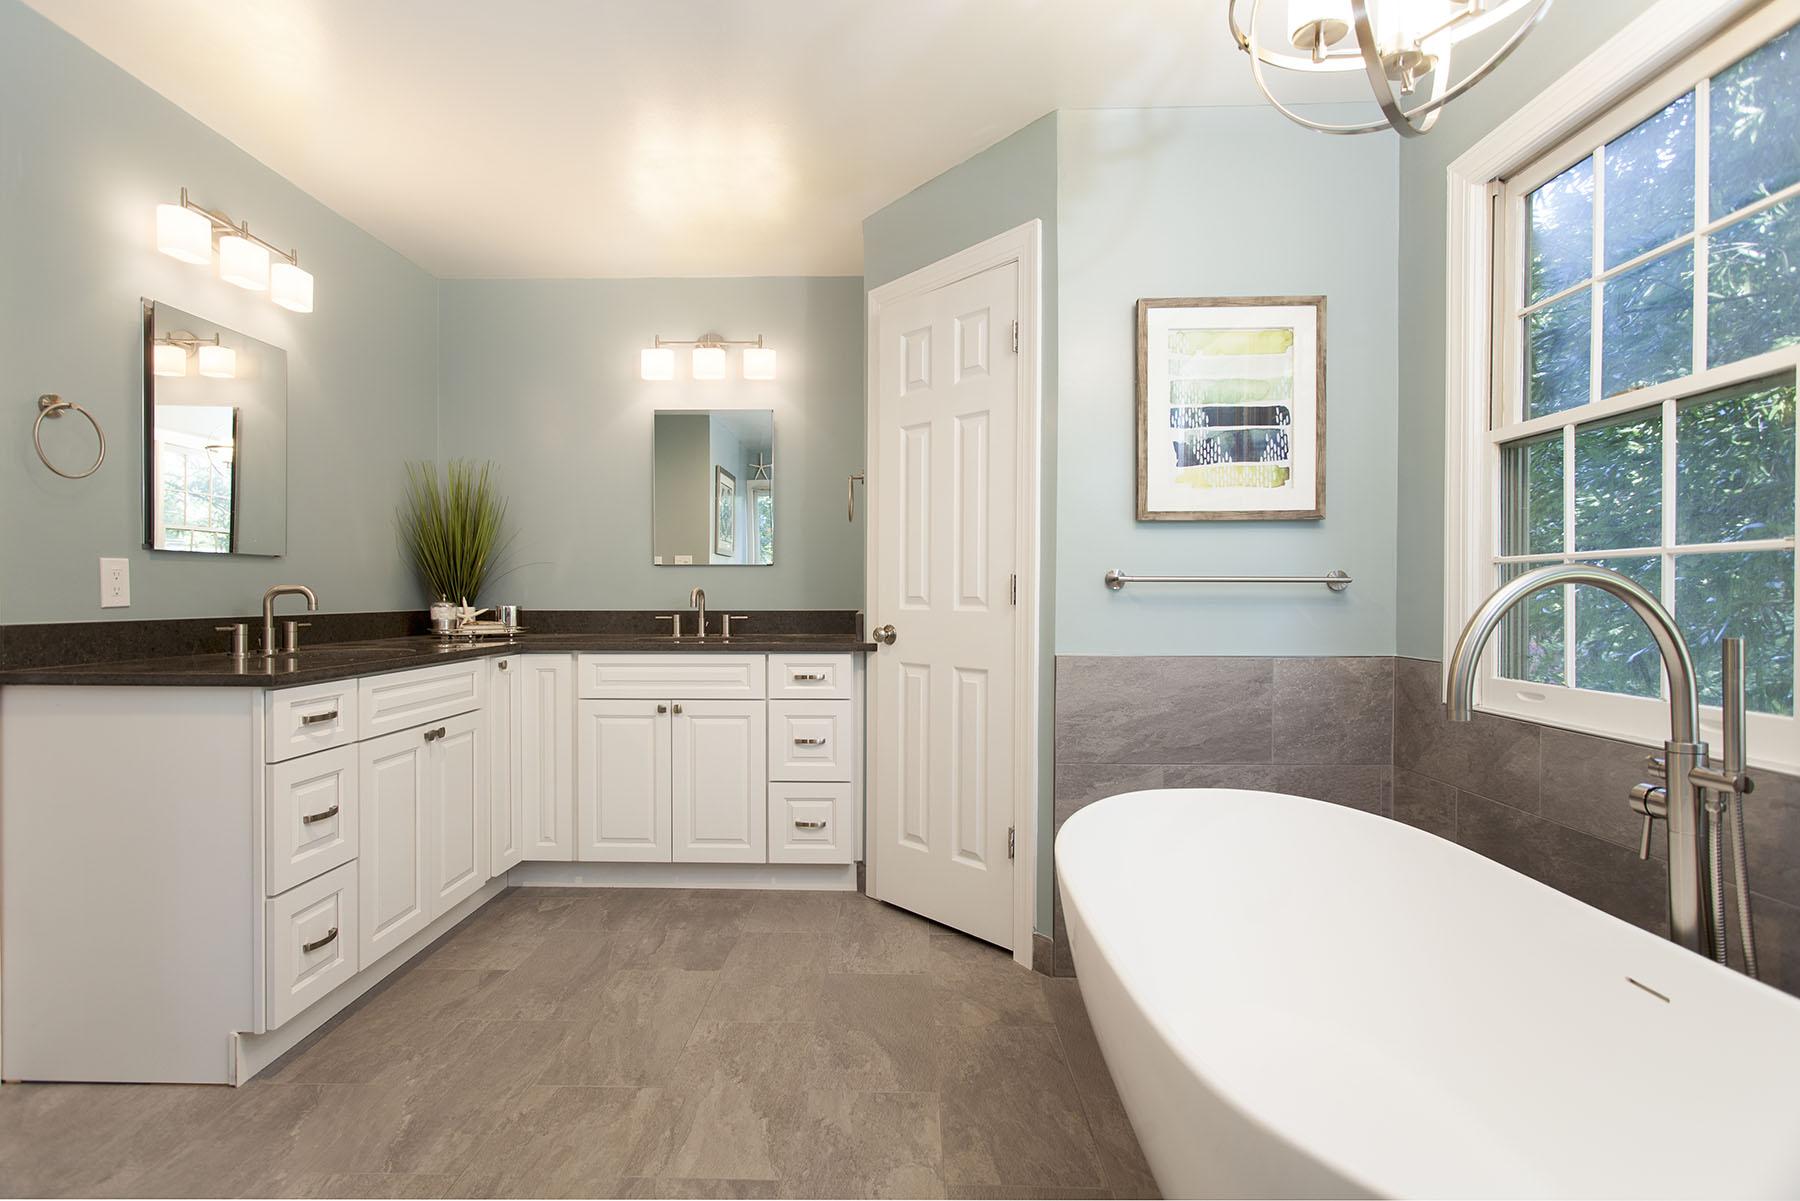 Master Bathroom Remodeling in Alexandria, VA - Solid ...